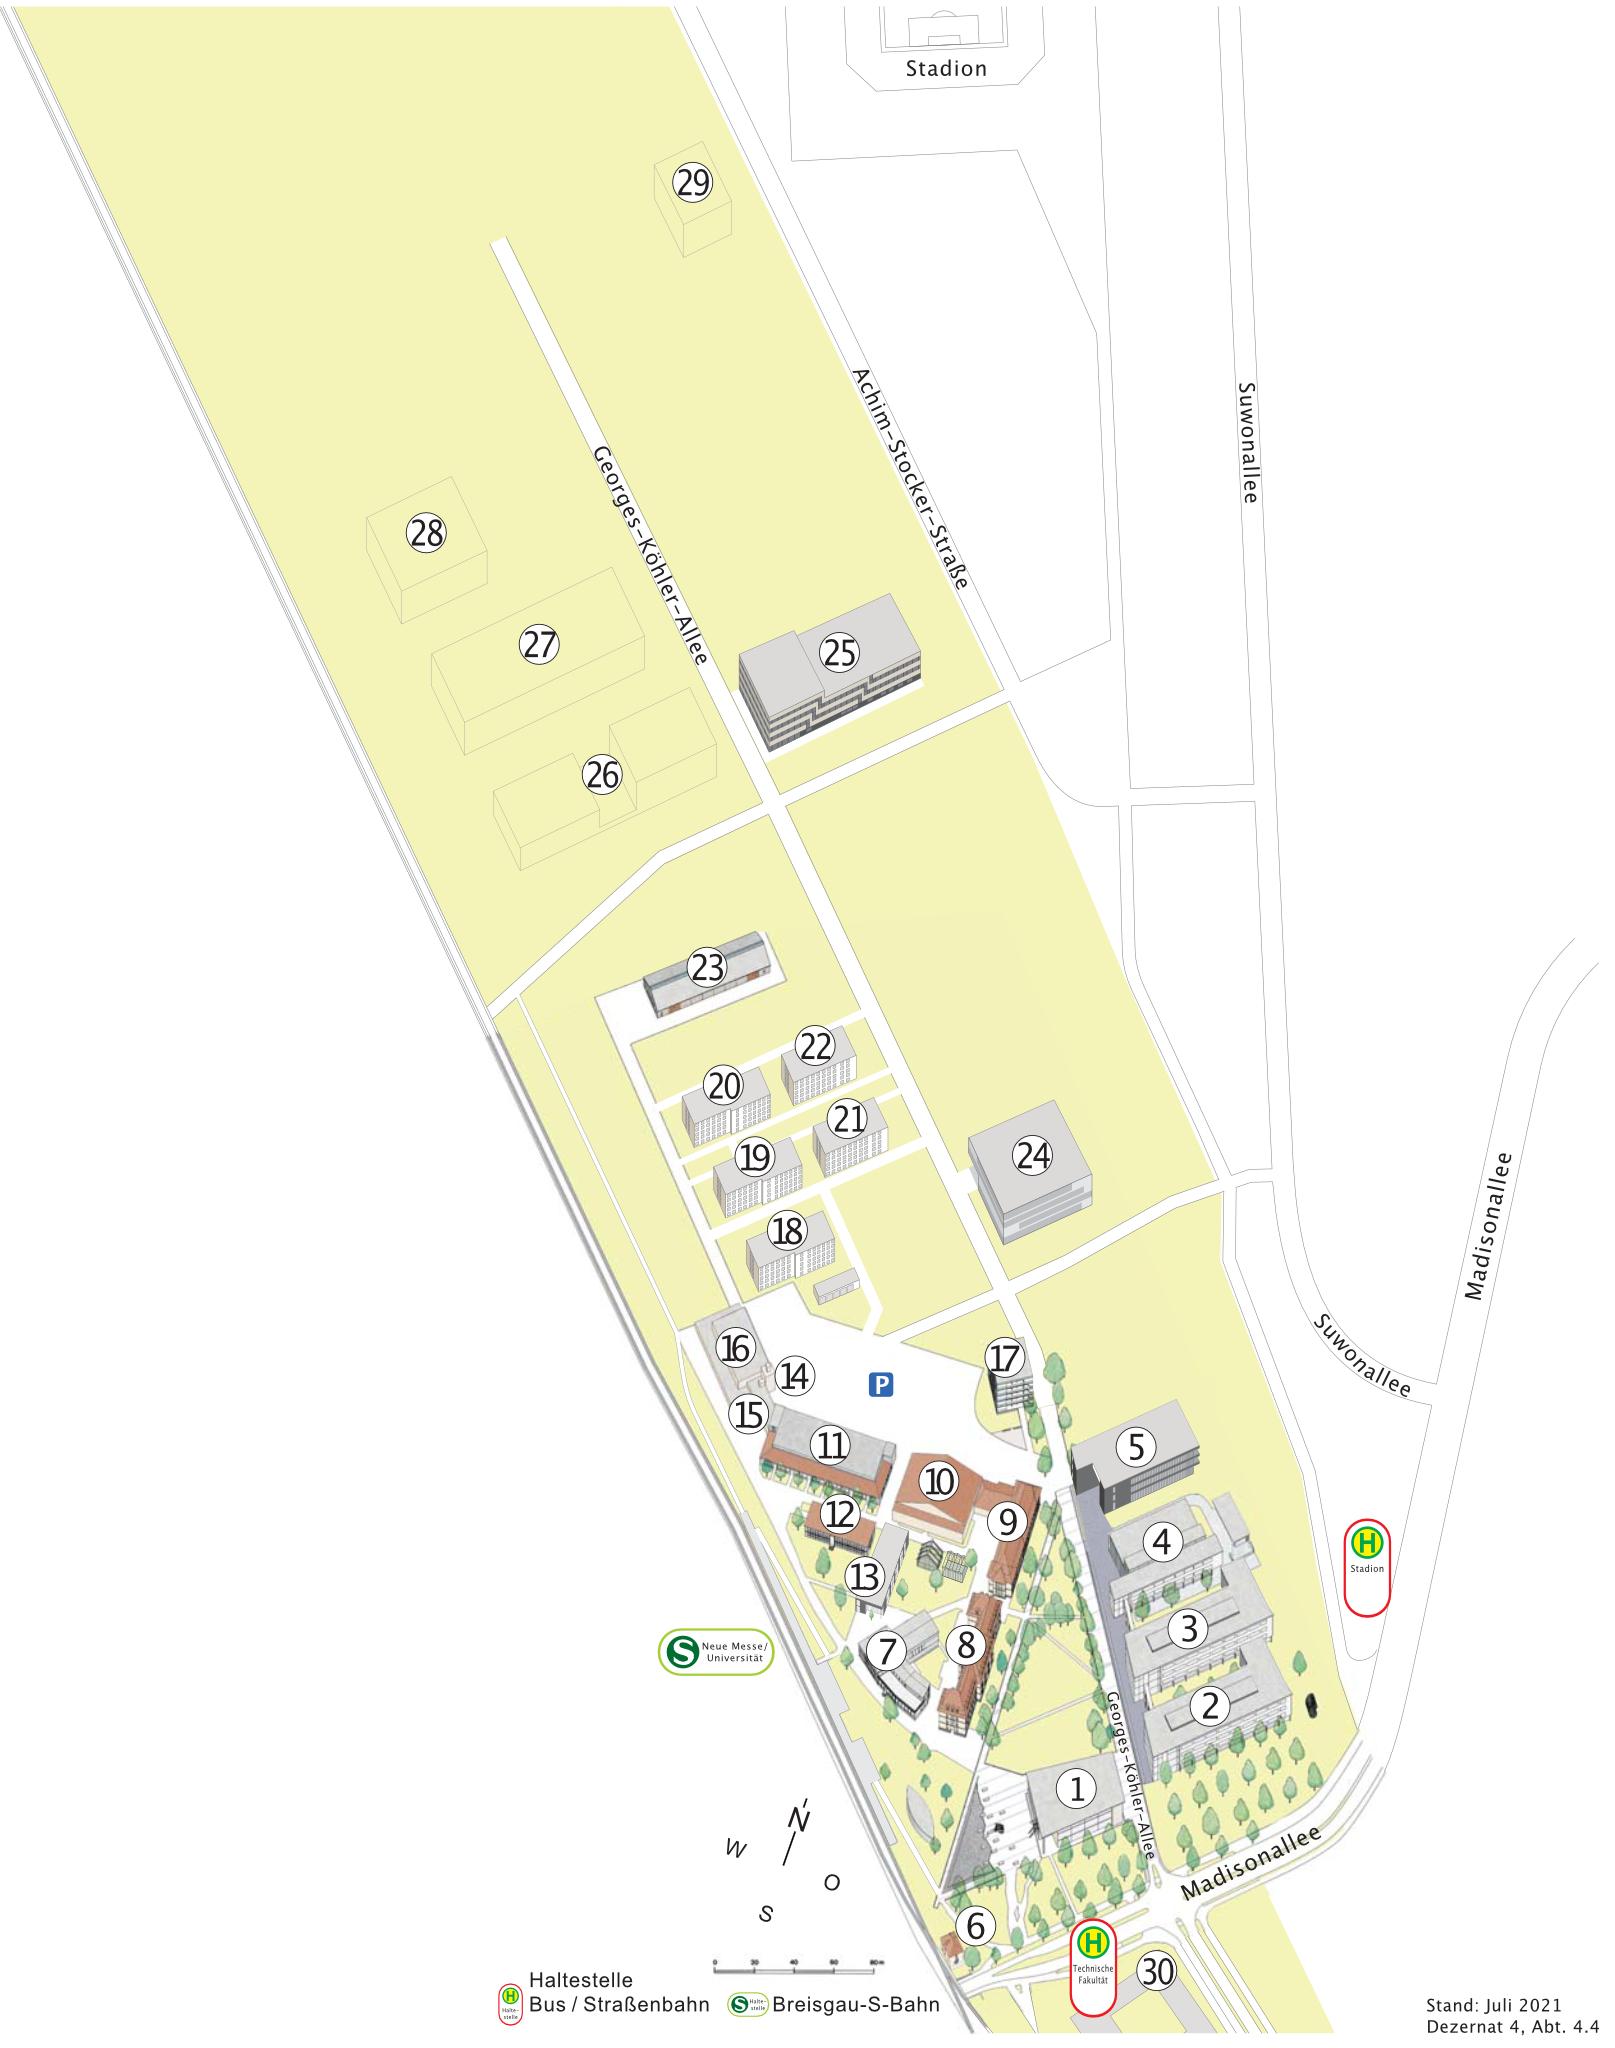 Stadtkarte, Ausschnitt Lageplan Technische Fakultät (Flugplatz)